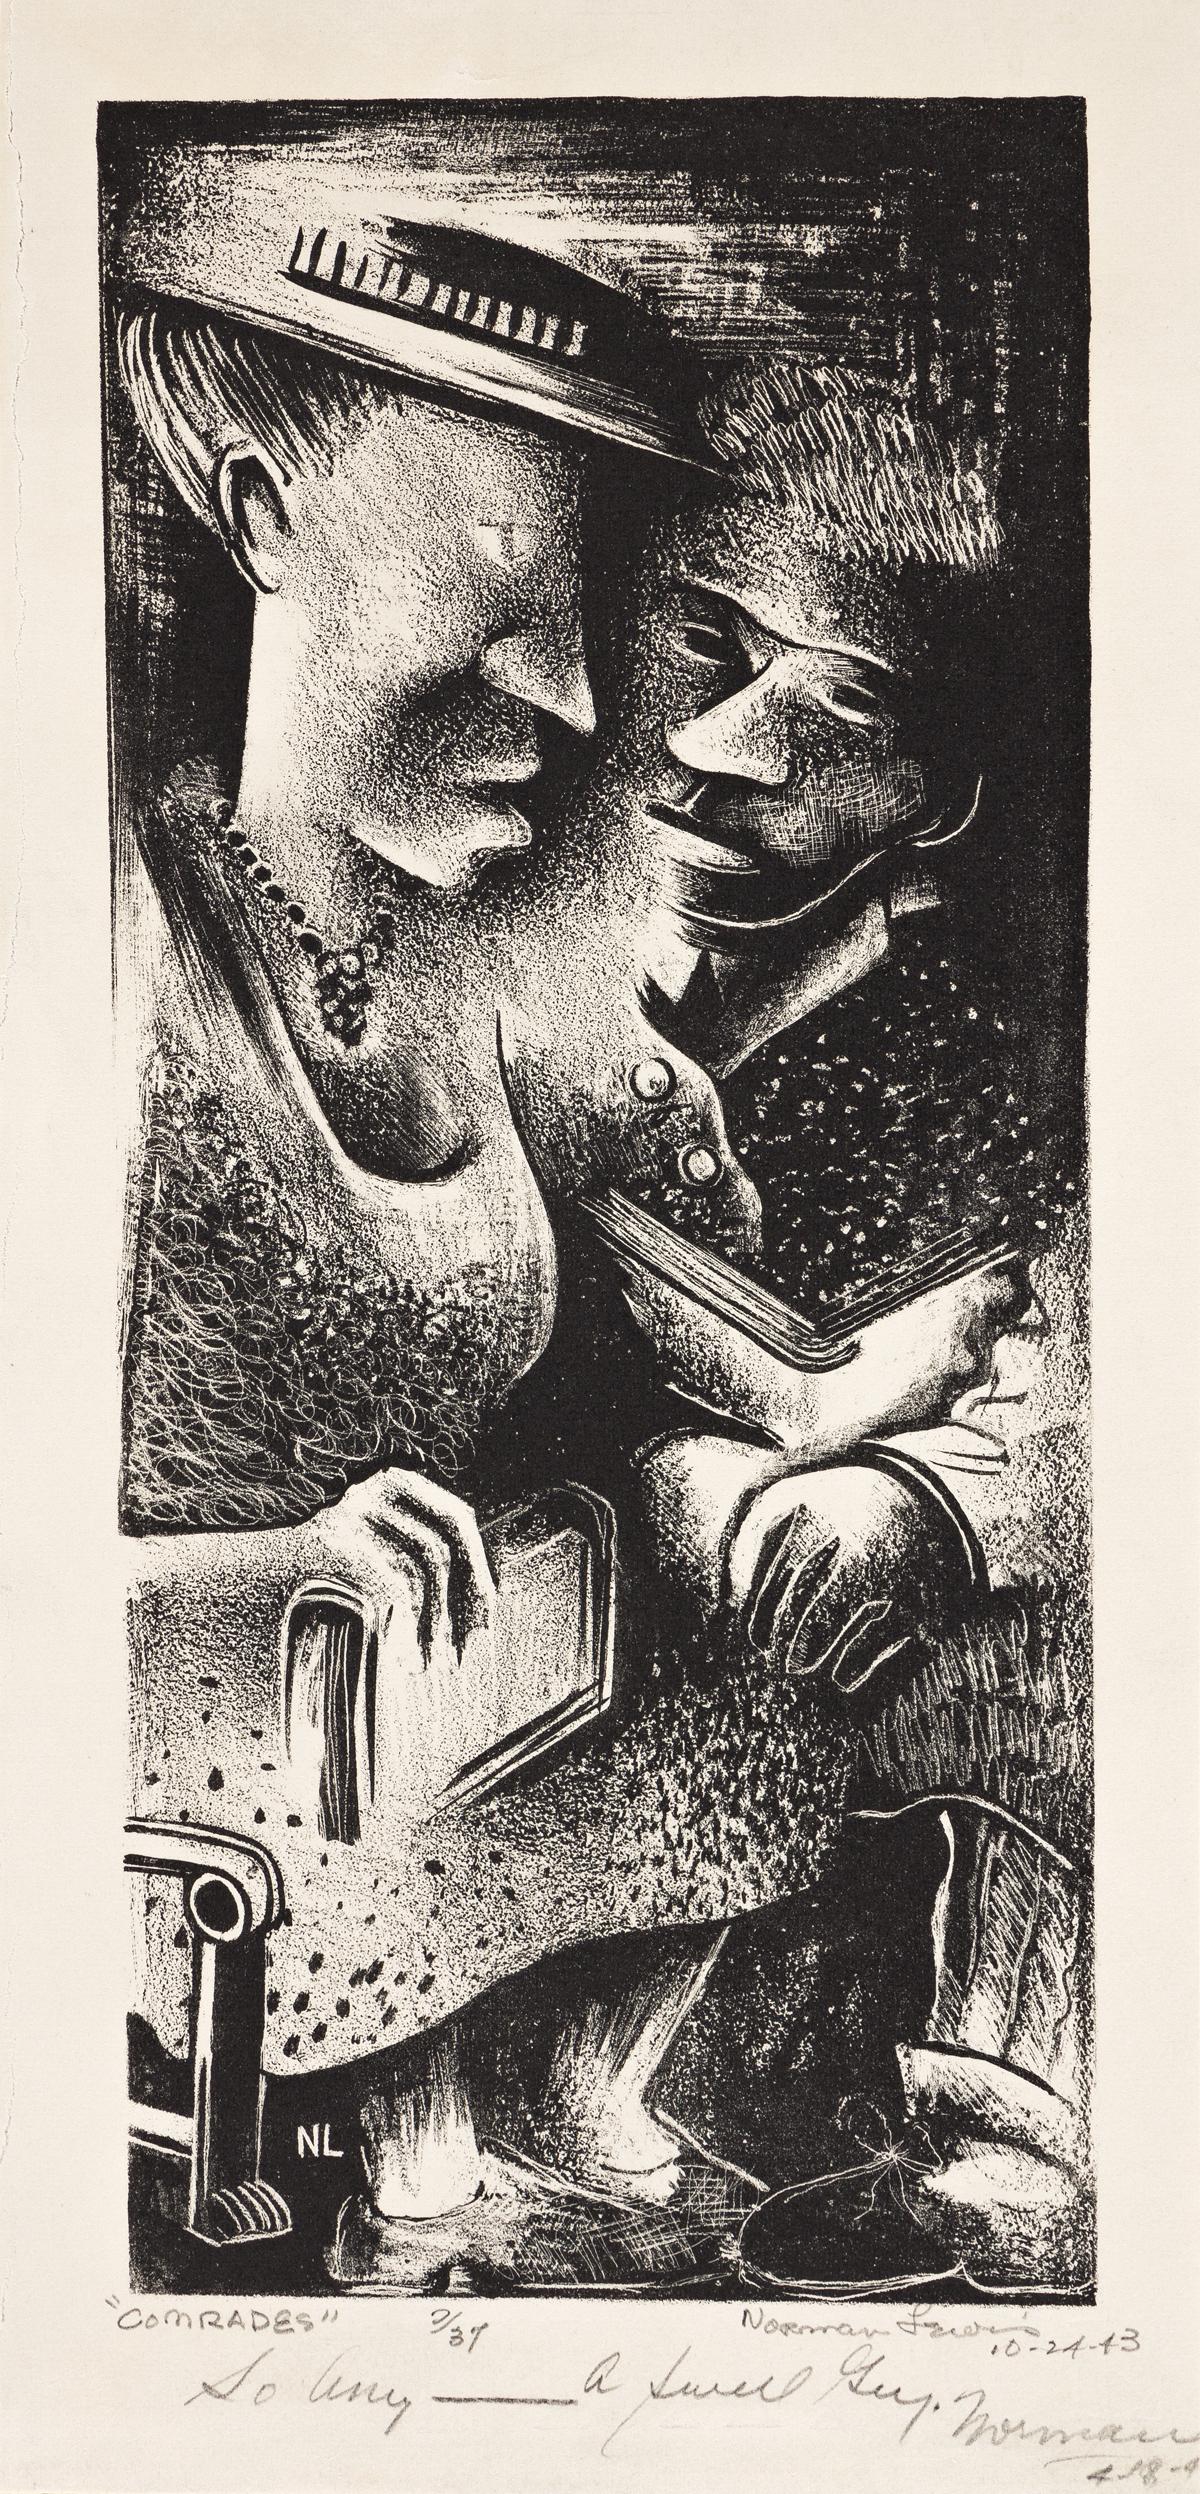 NORMAN LEWIS (1909 - 1979) Comrades.